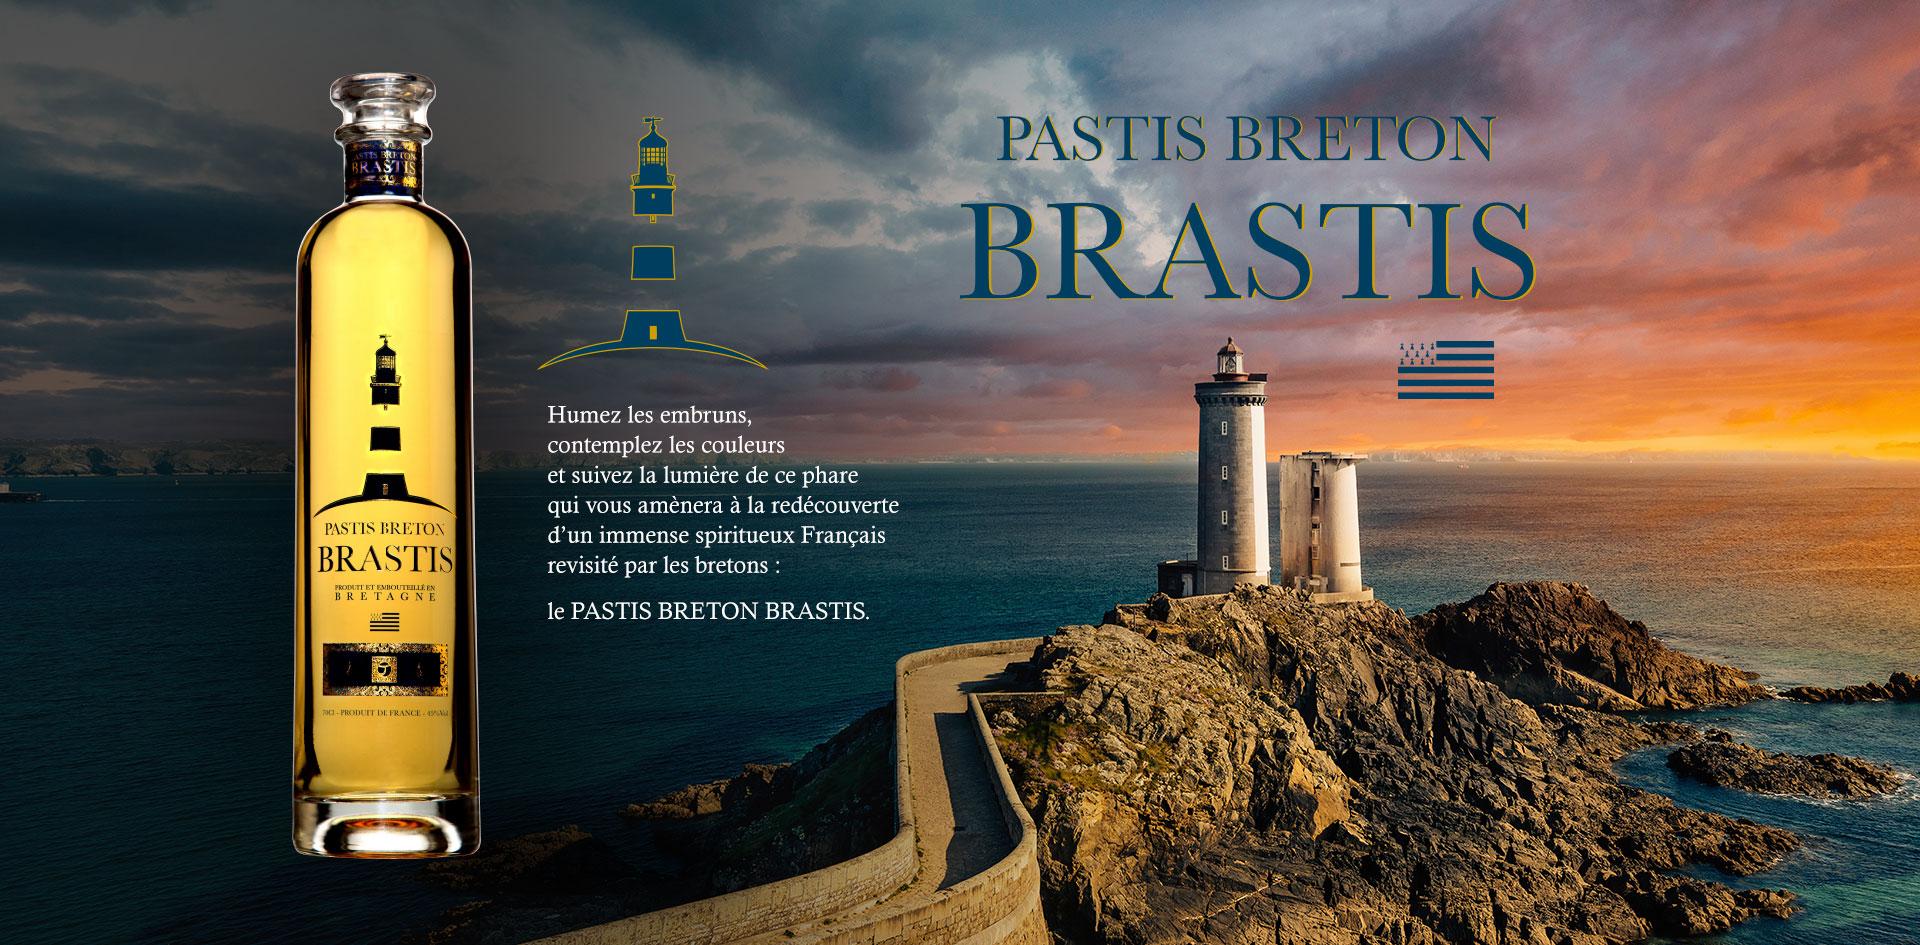 Pastis Breton : BRASTIS